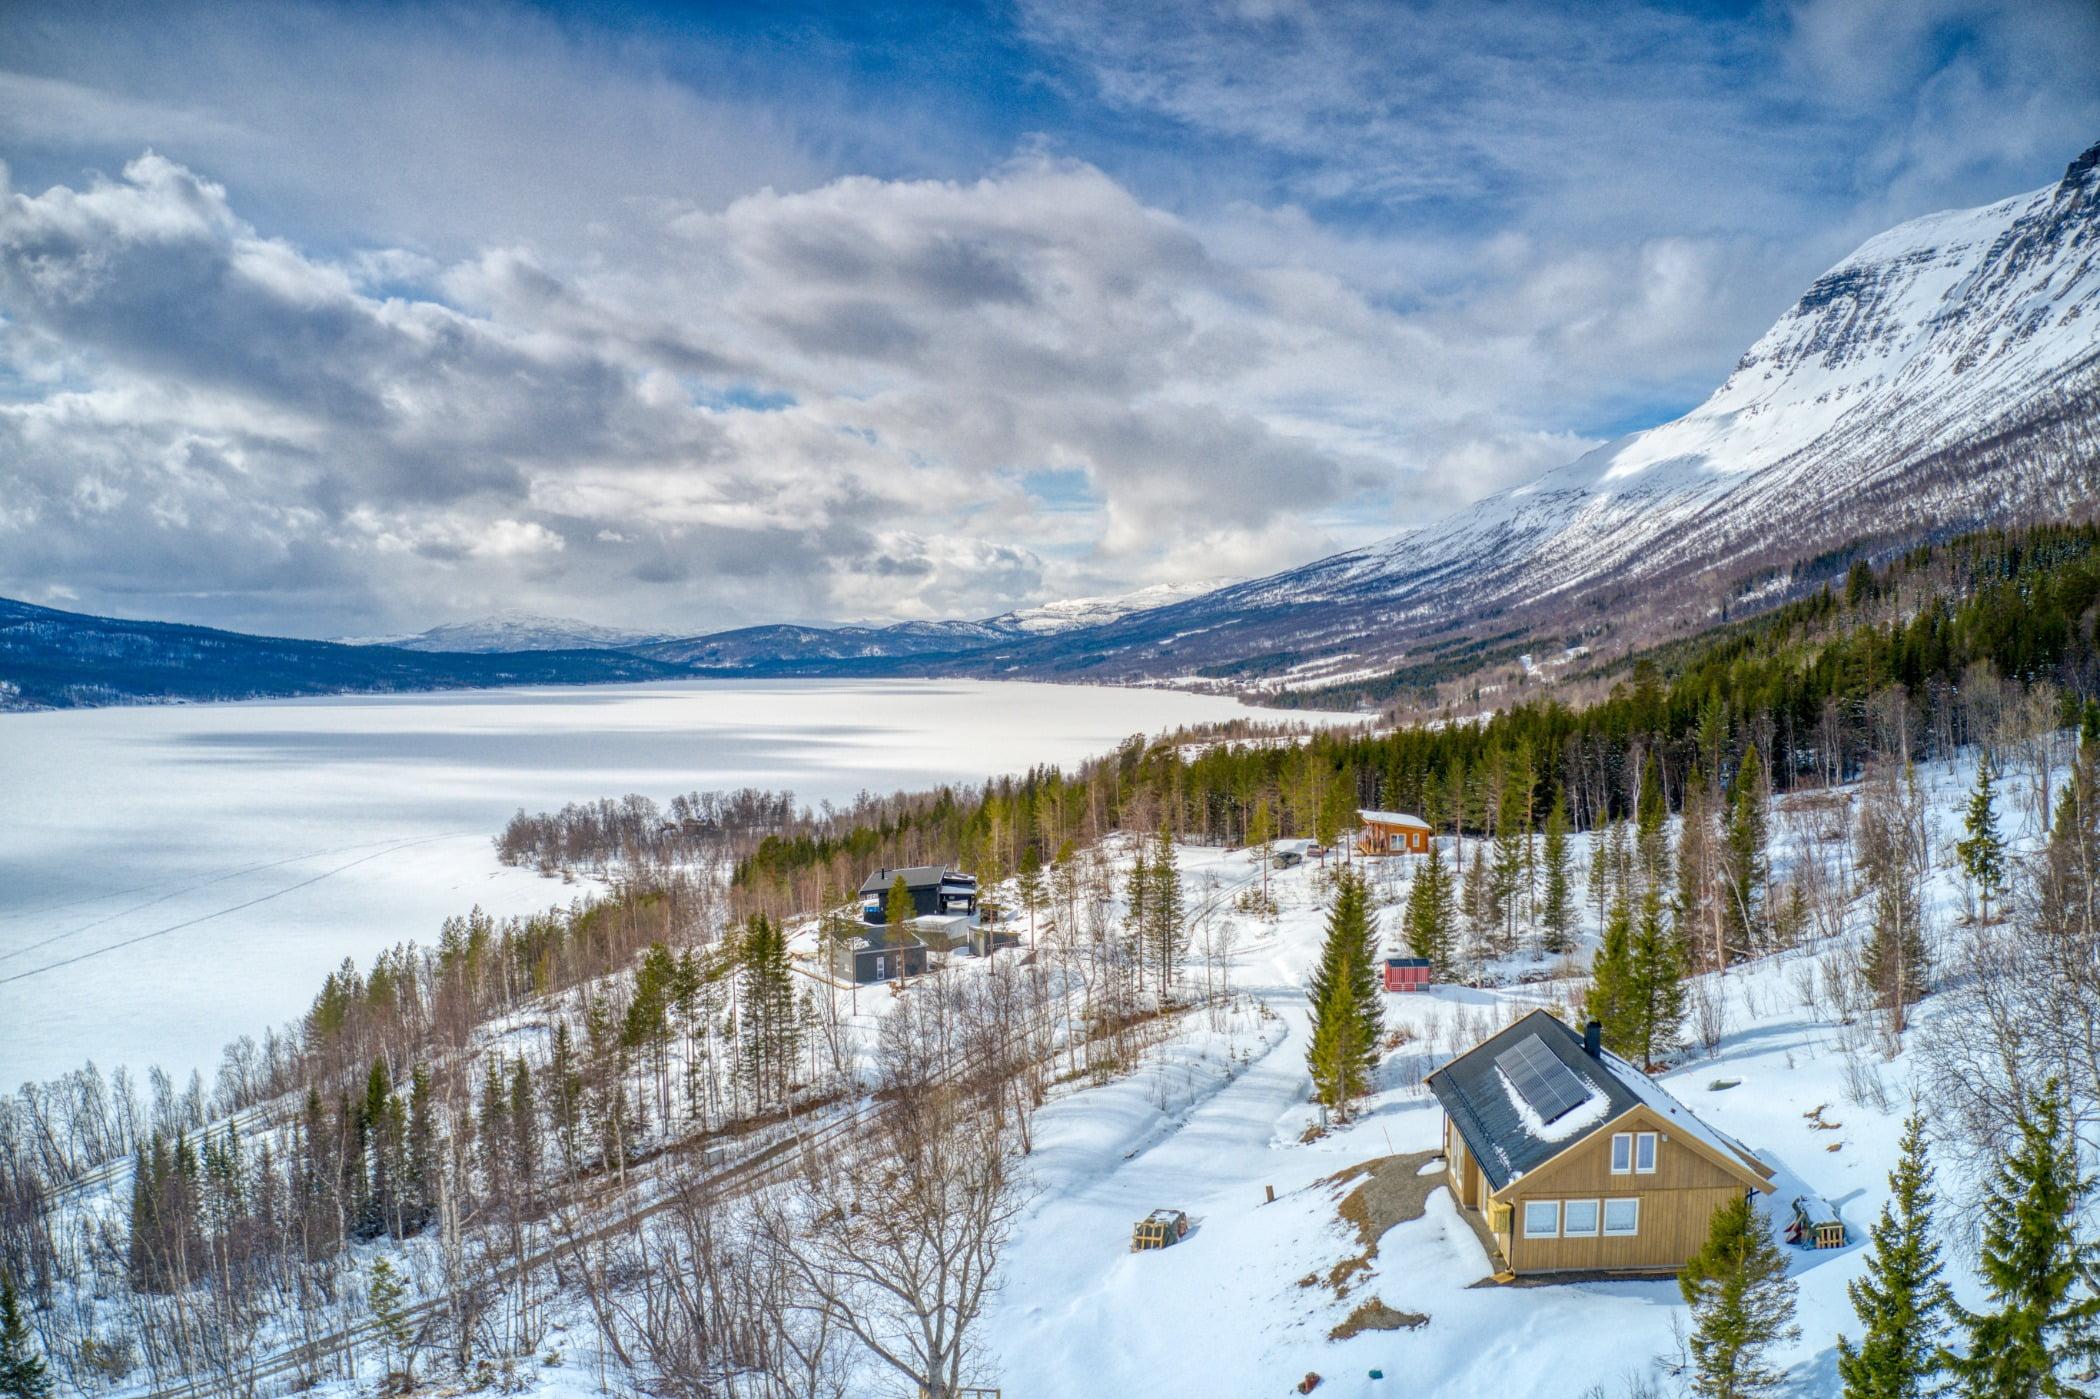 Natural landscape, Cloud, Sky, Snow, Mountain, Nature, Slope, Highland, Freezing, Tree